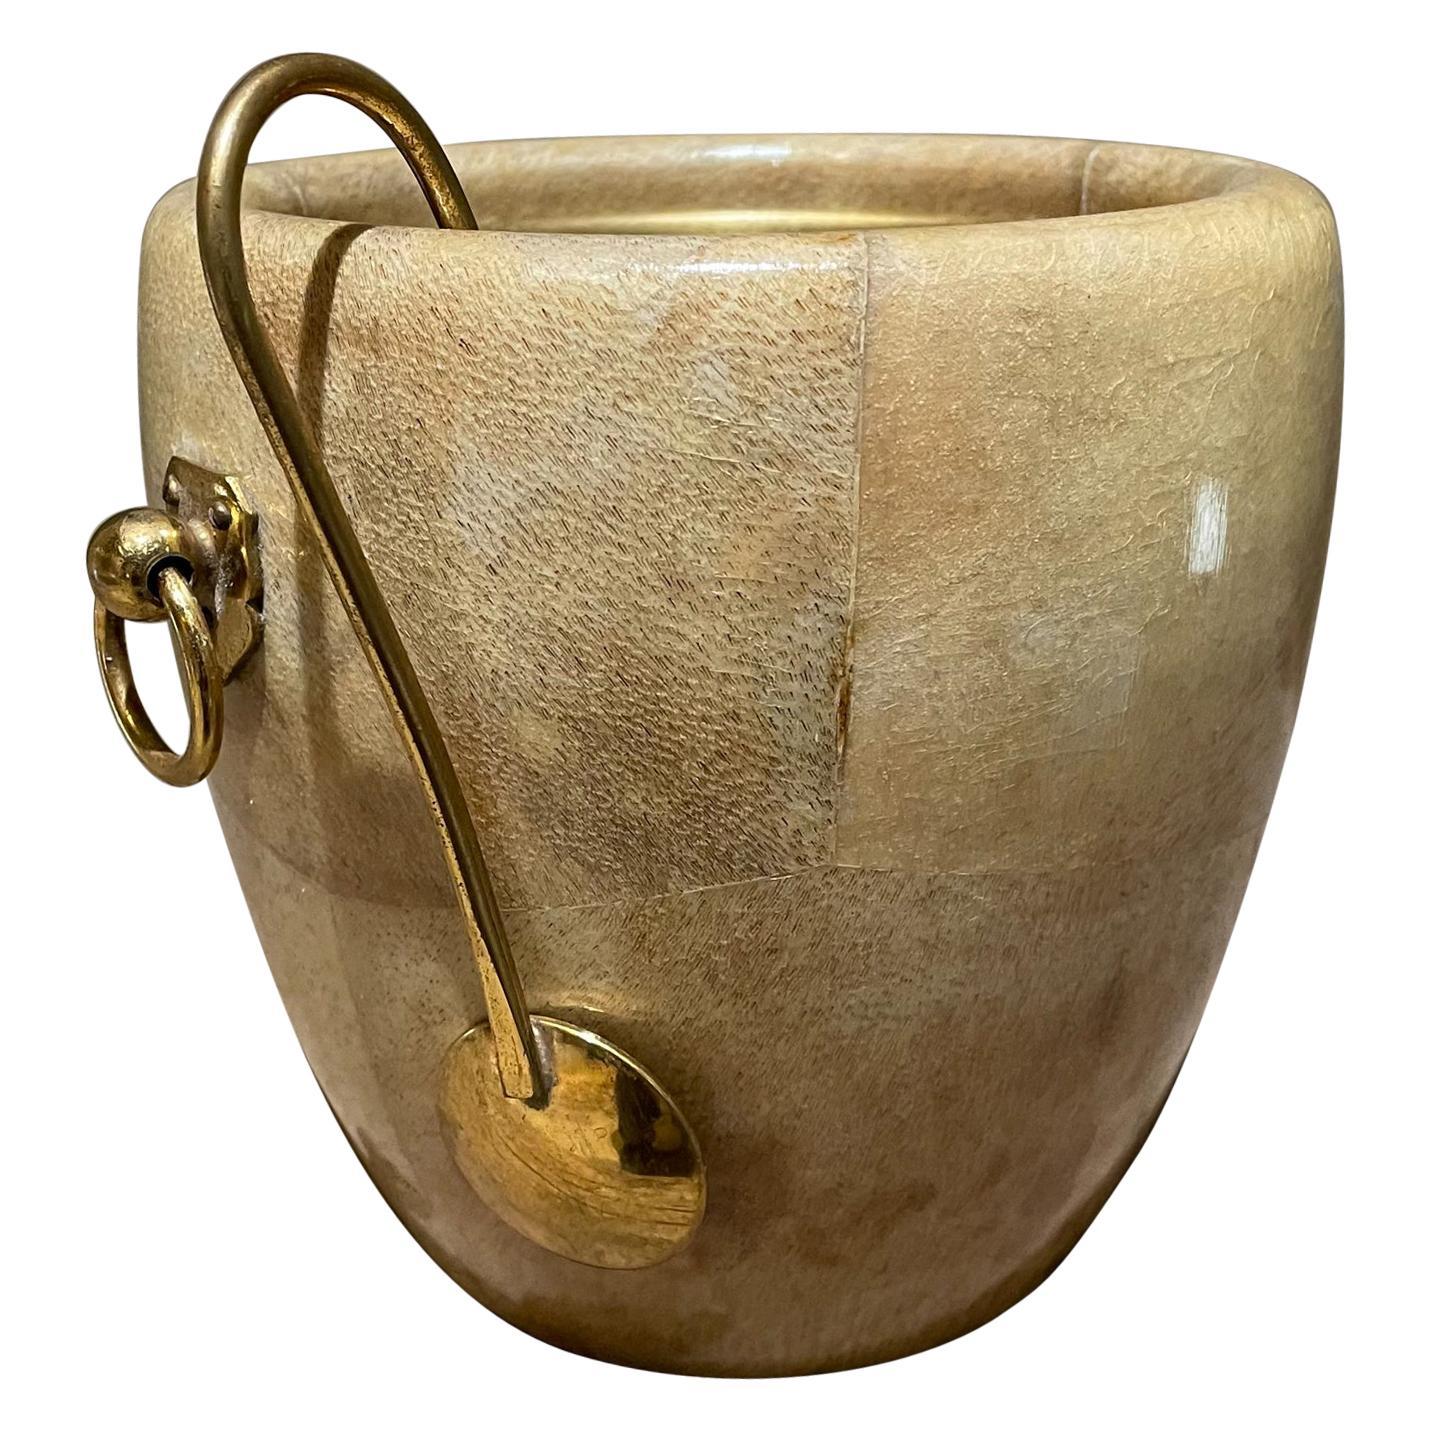 Aldo Tura Golden Goatskin Leather Brass Ice Bucket & Tongs Italy 1950s Milano